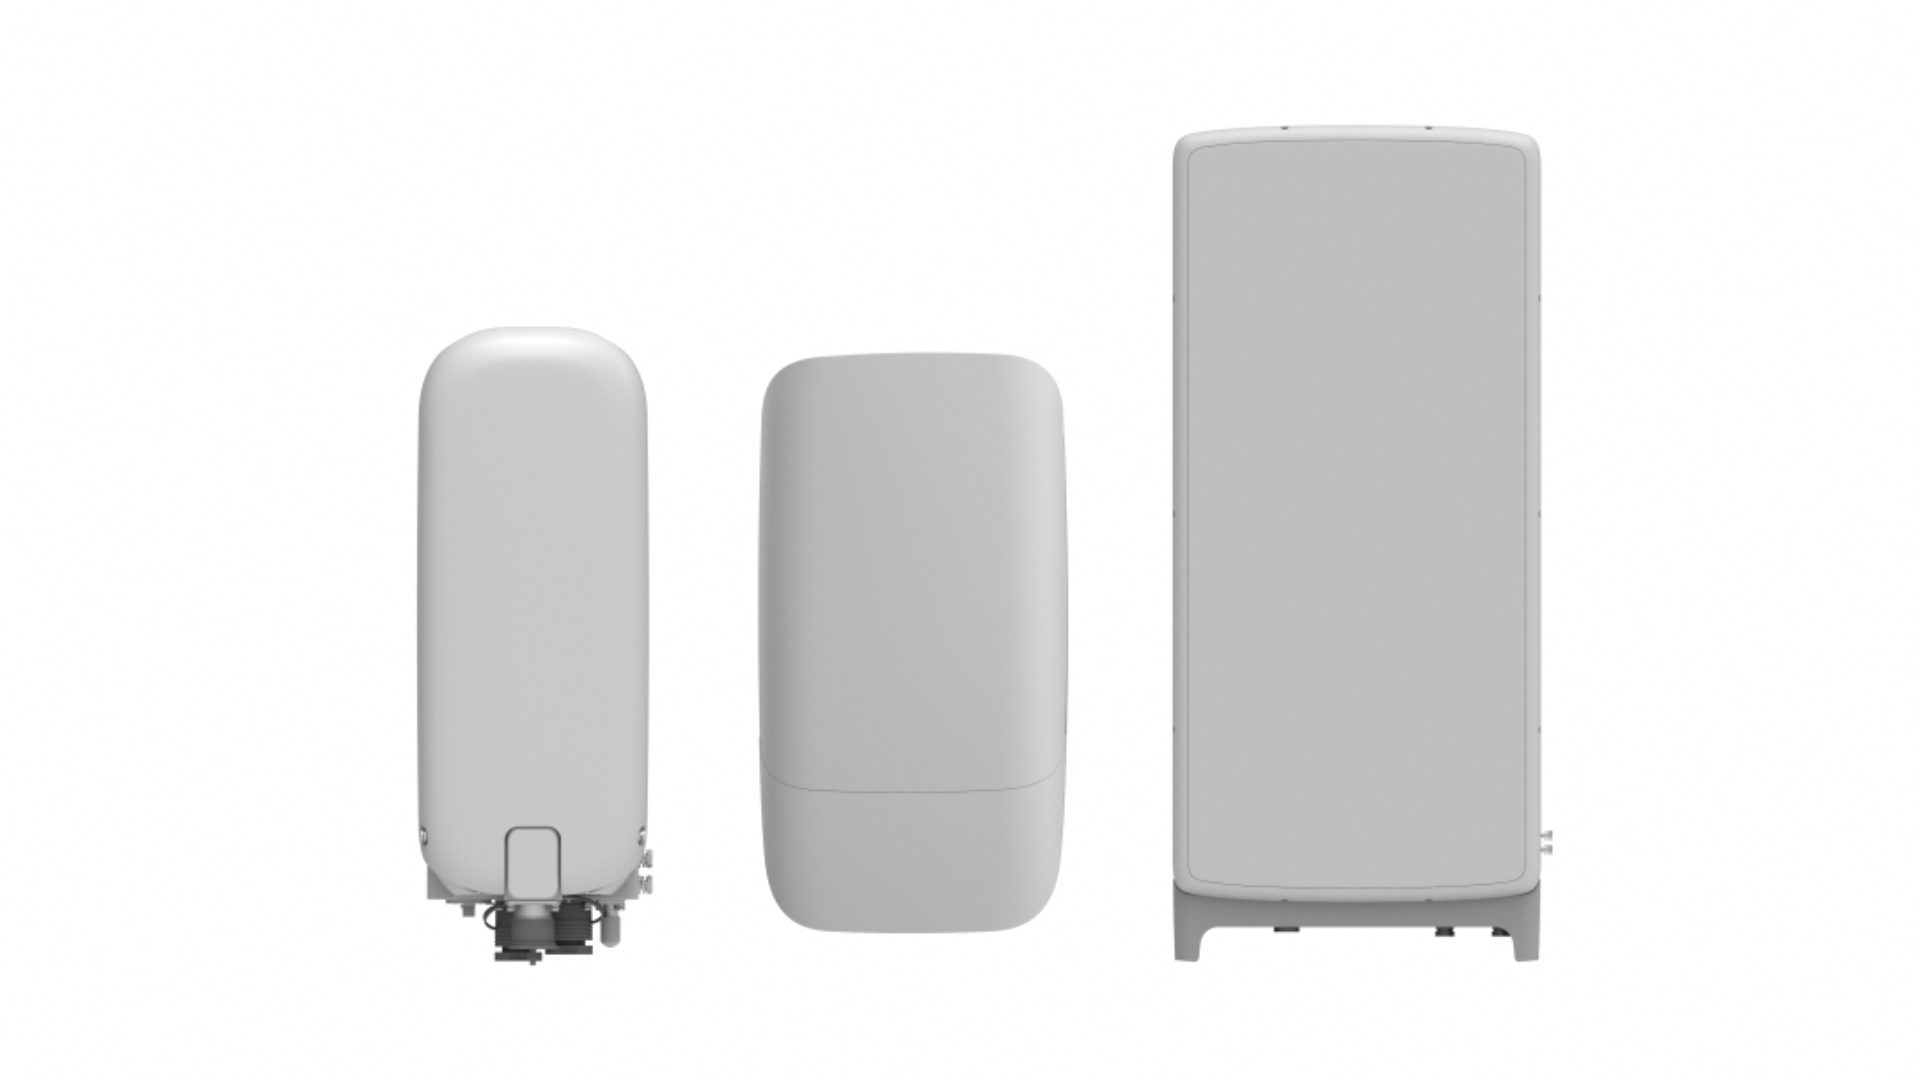 Samsung's latest Citizen Broadband Radio Service (CBRS) solutions